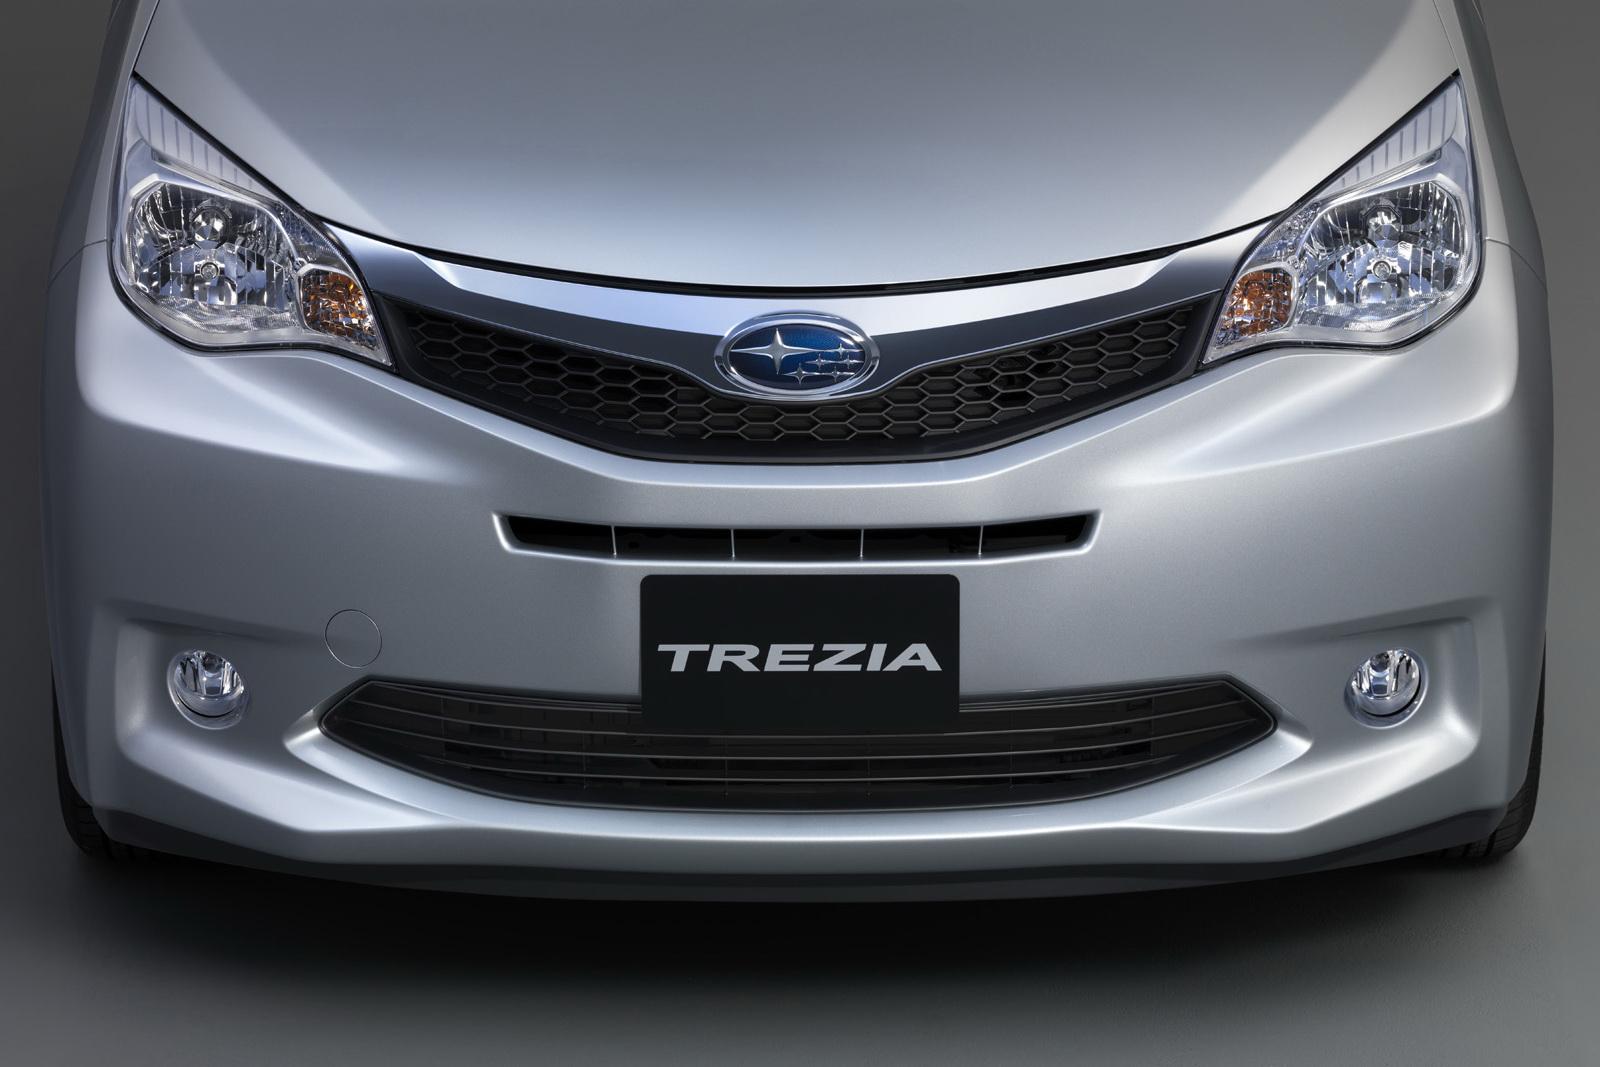 Nouveau Trezia Le Toyota Verso S De Subaru